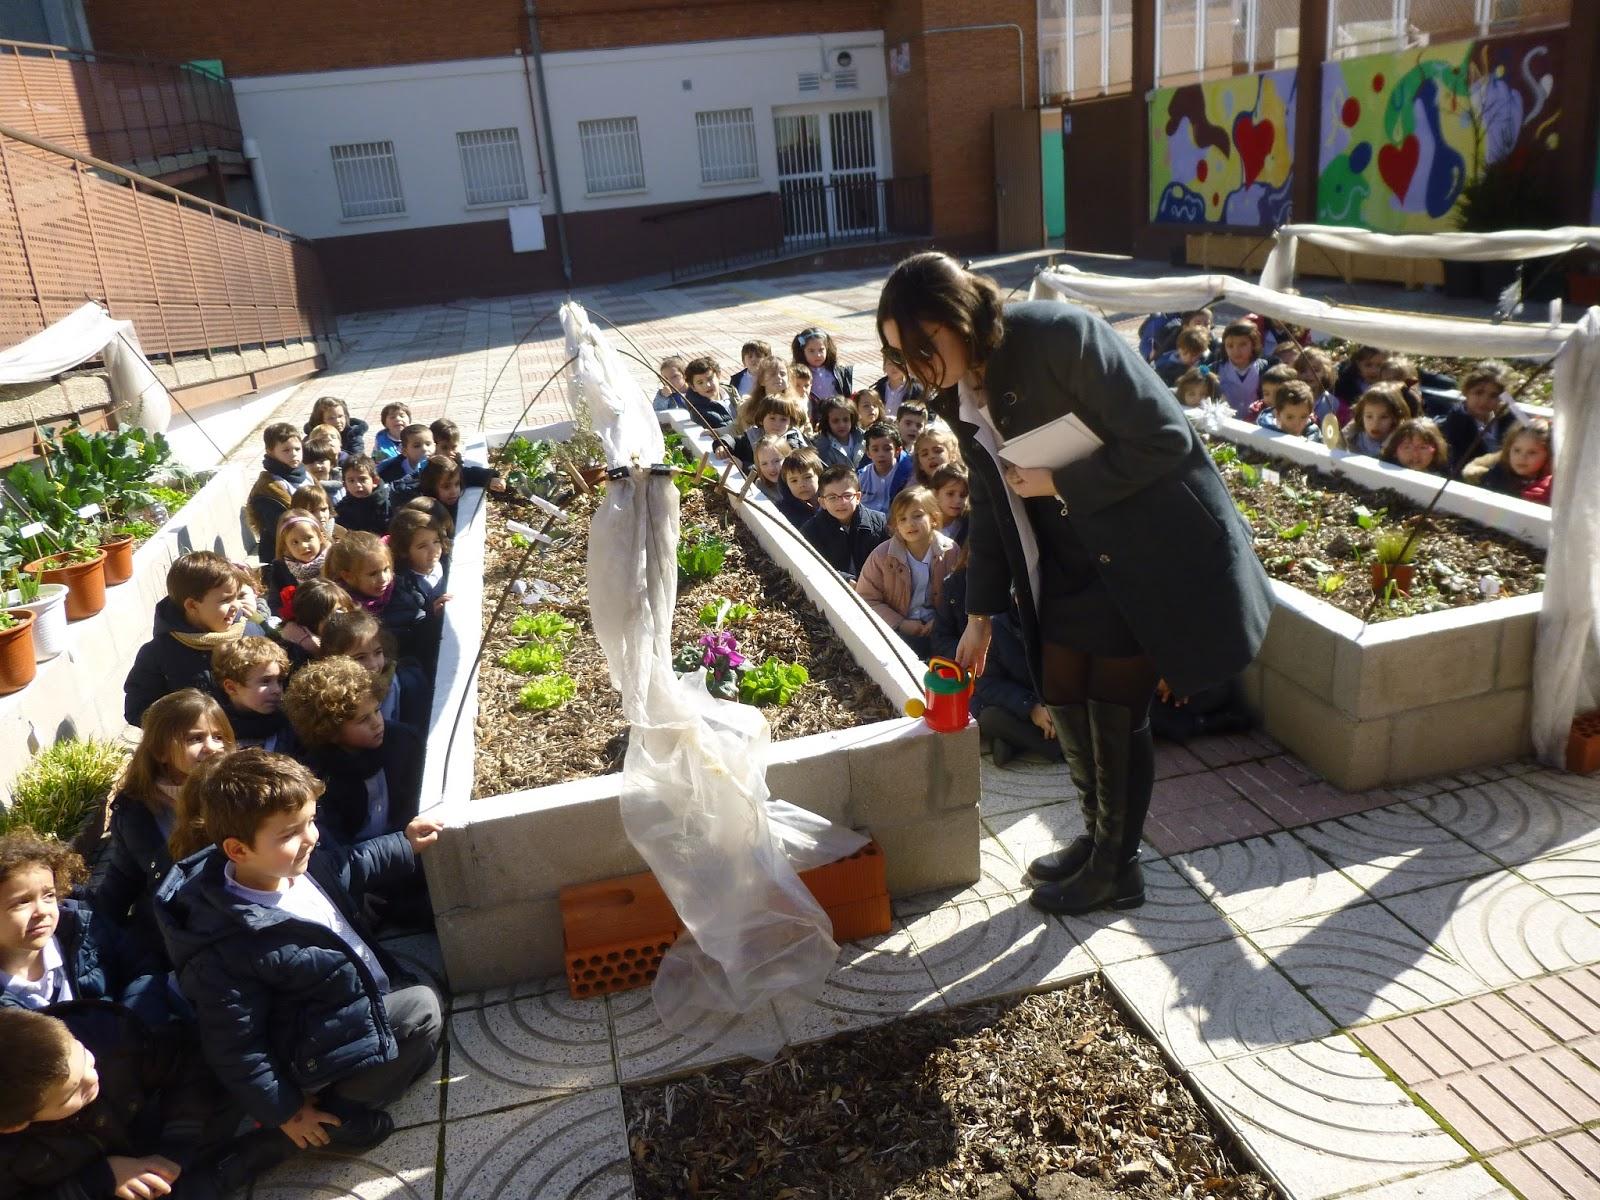 Agustinas Valladolid - 2017 - Infantil 2 - Inglés en el Huerto 4